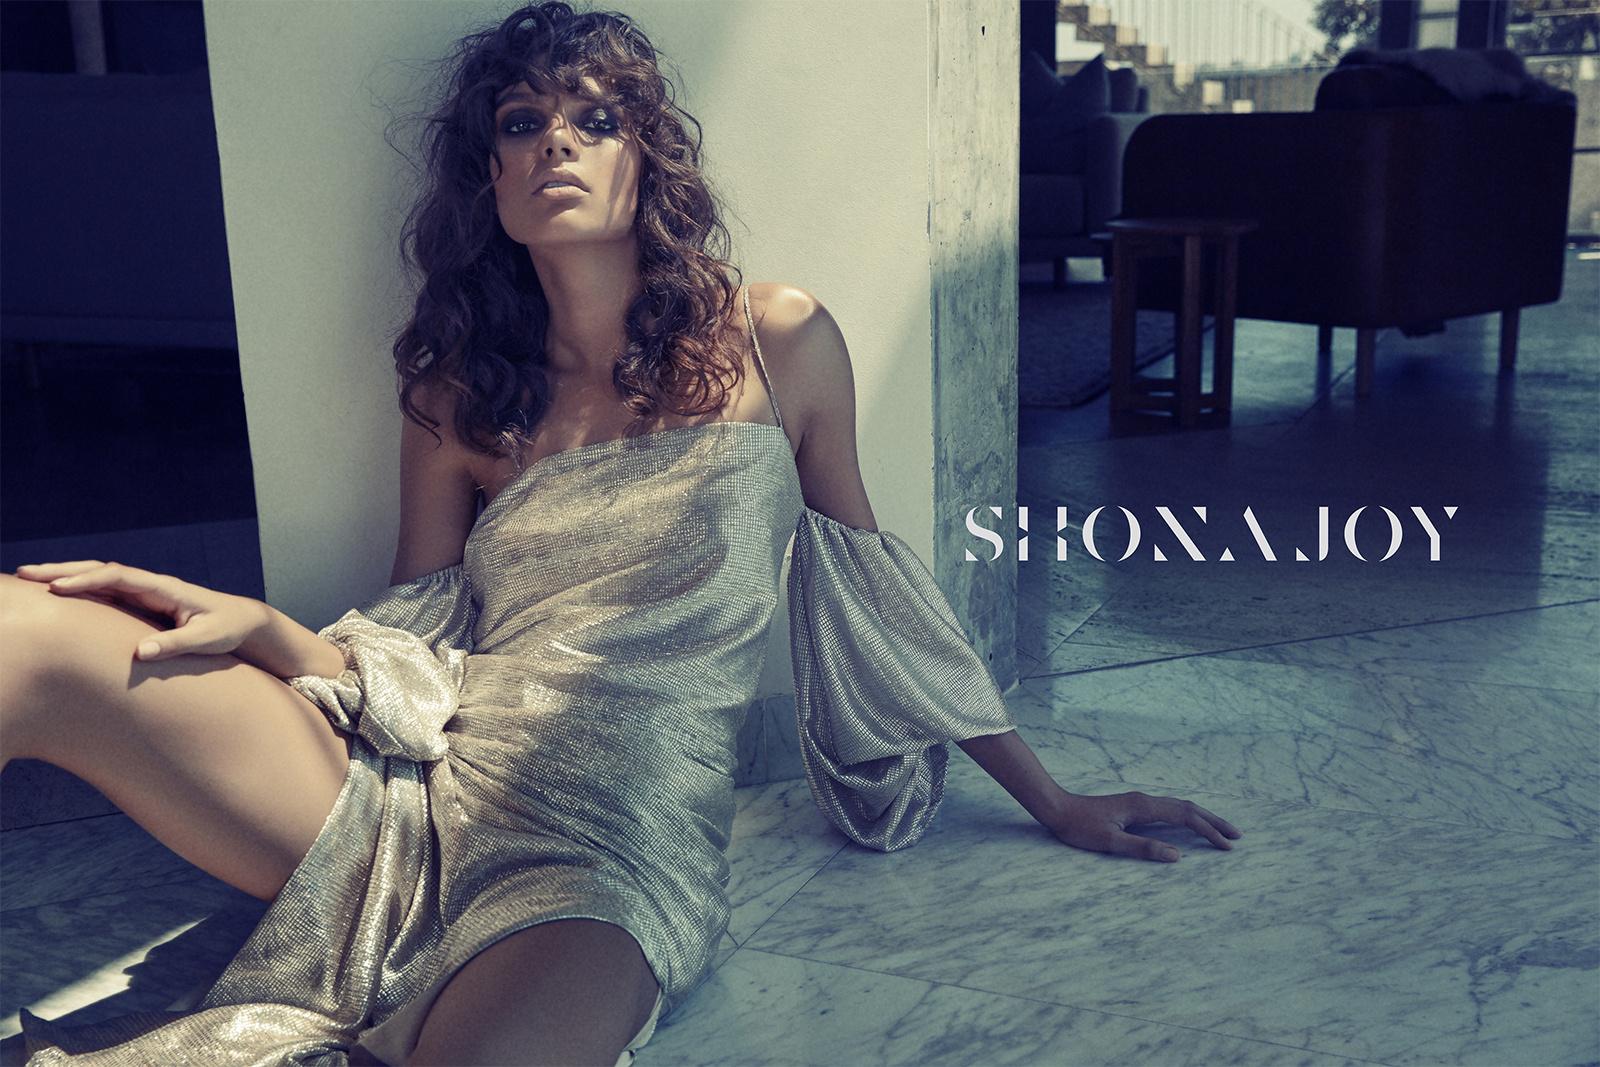 SHONA JOY CAMPAIGN